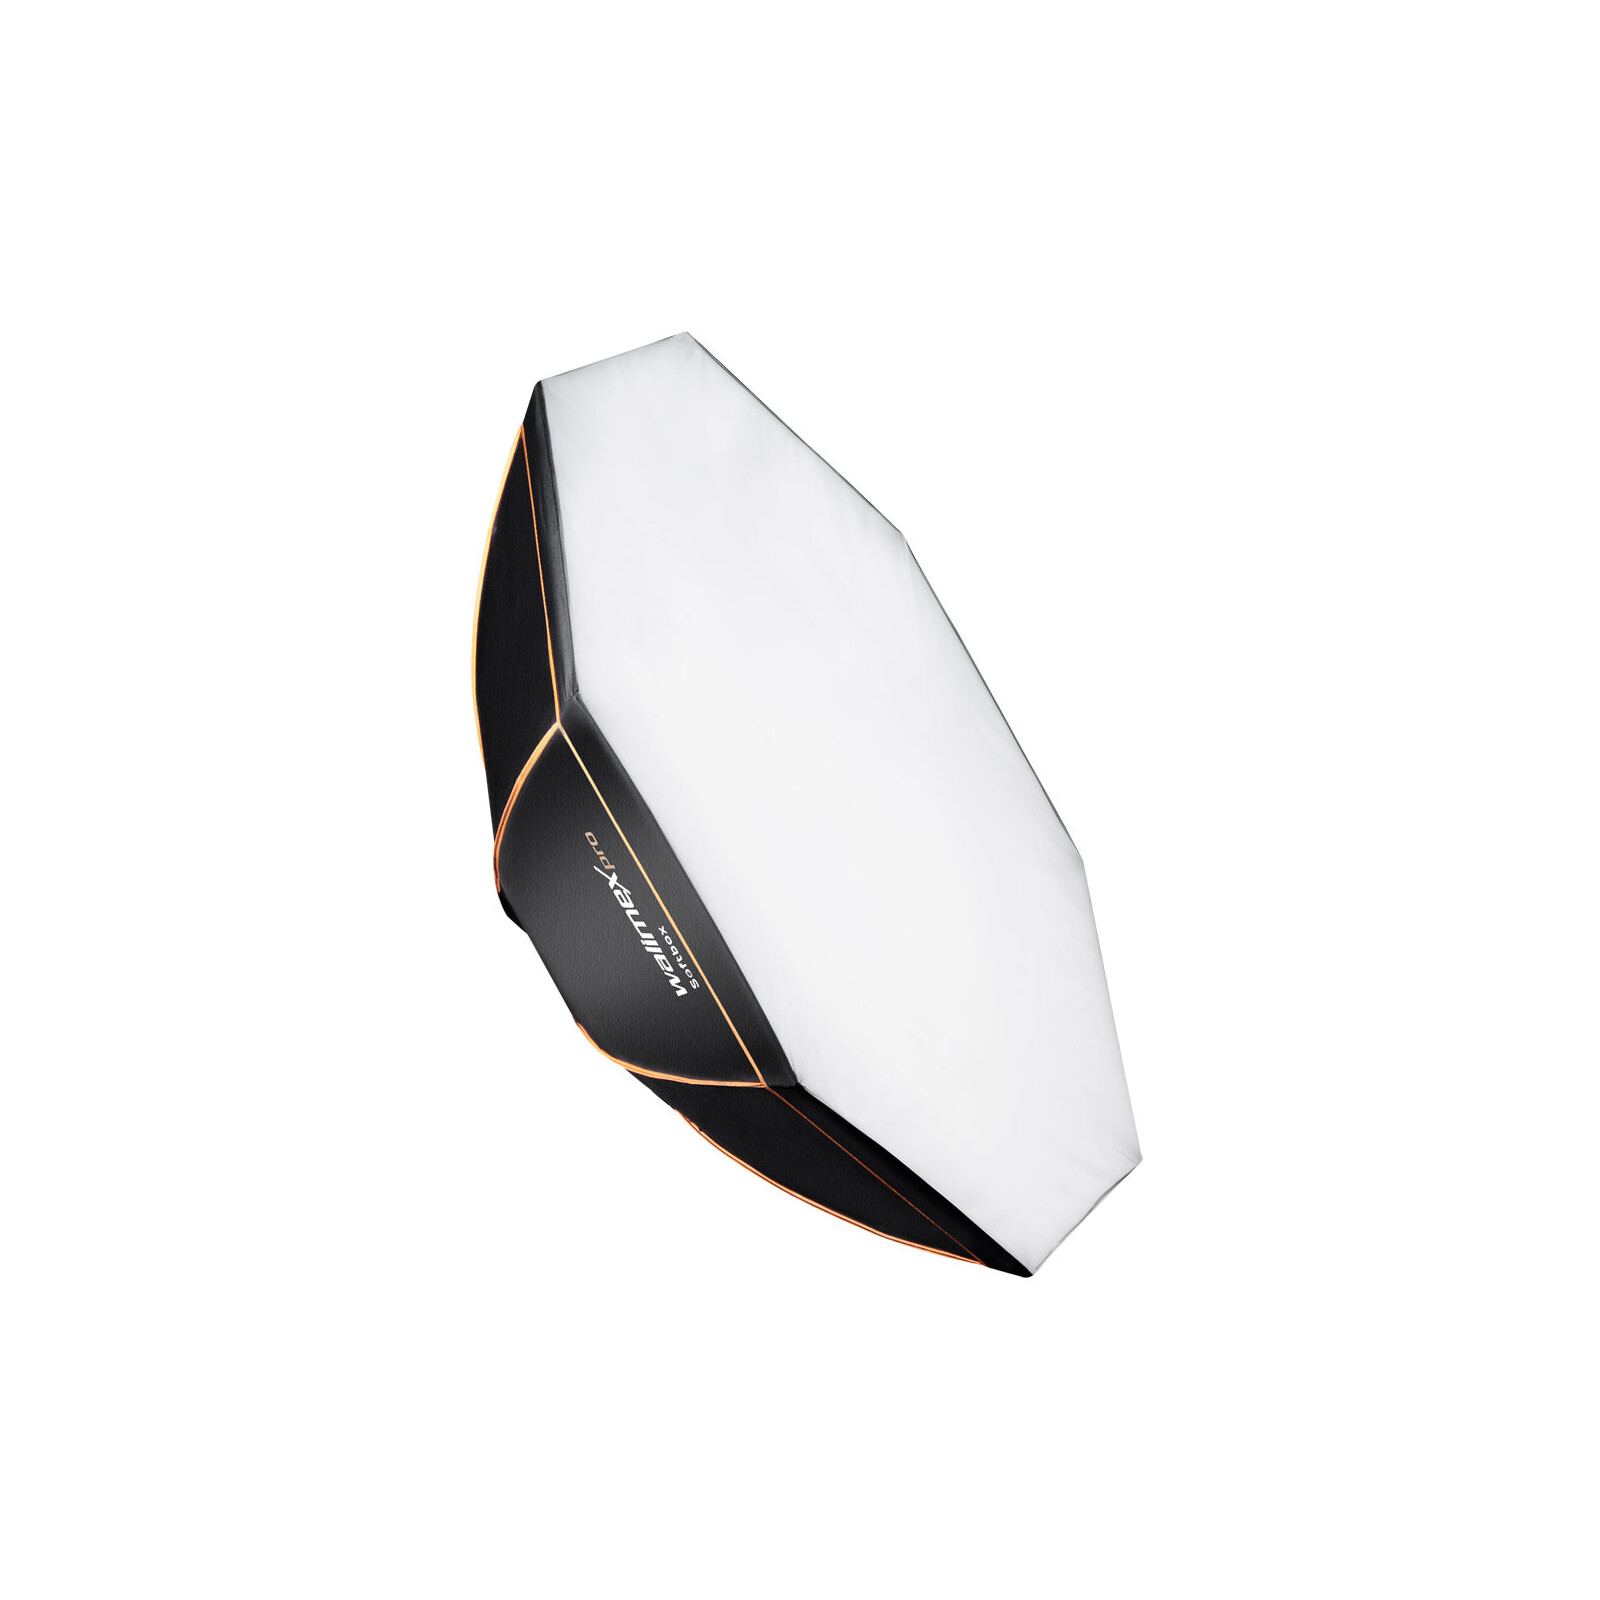 walimex pro Octagon Softbox OL Ø90 Electra Small